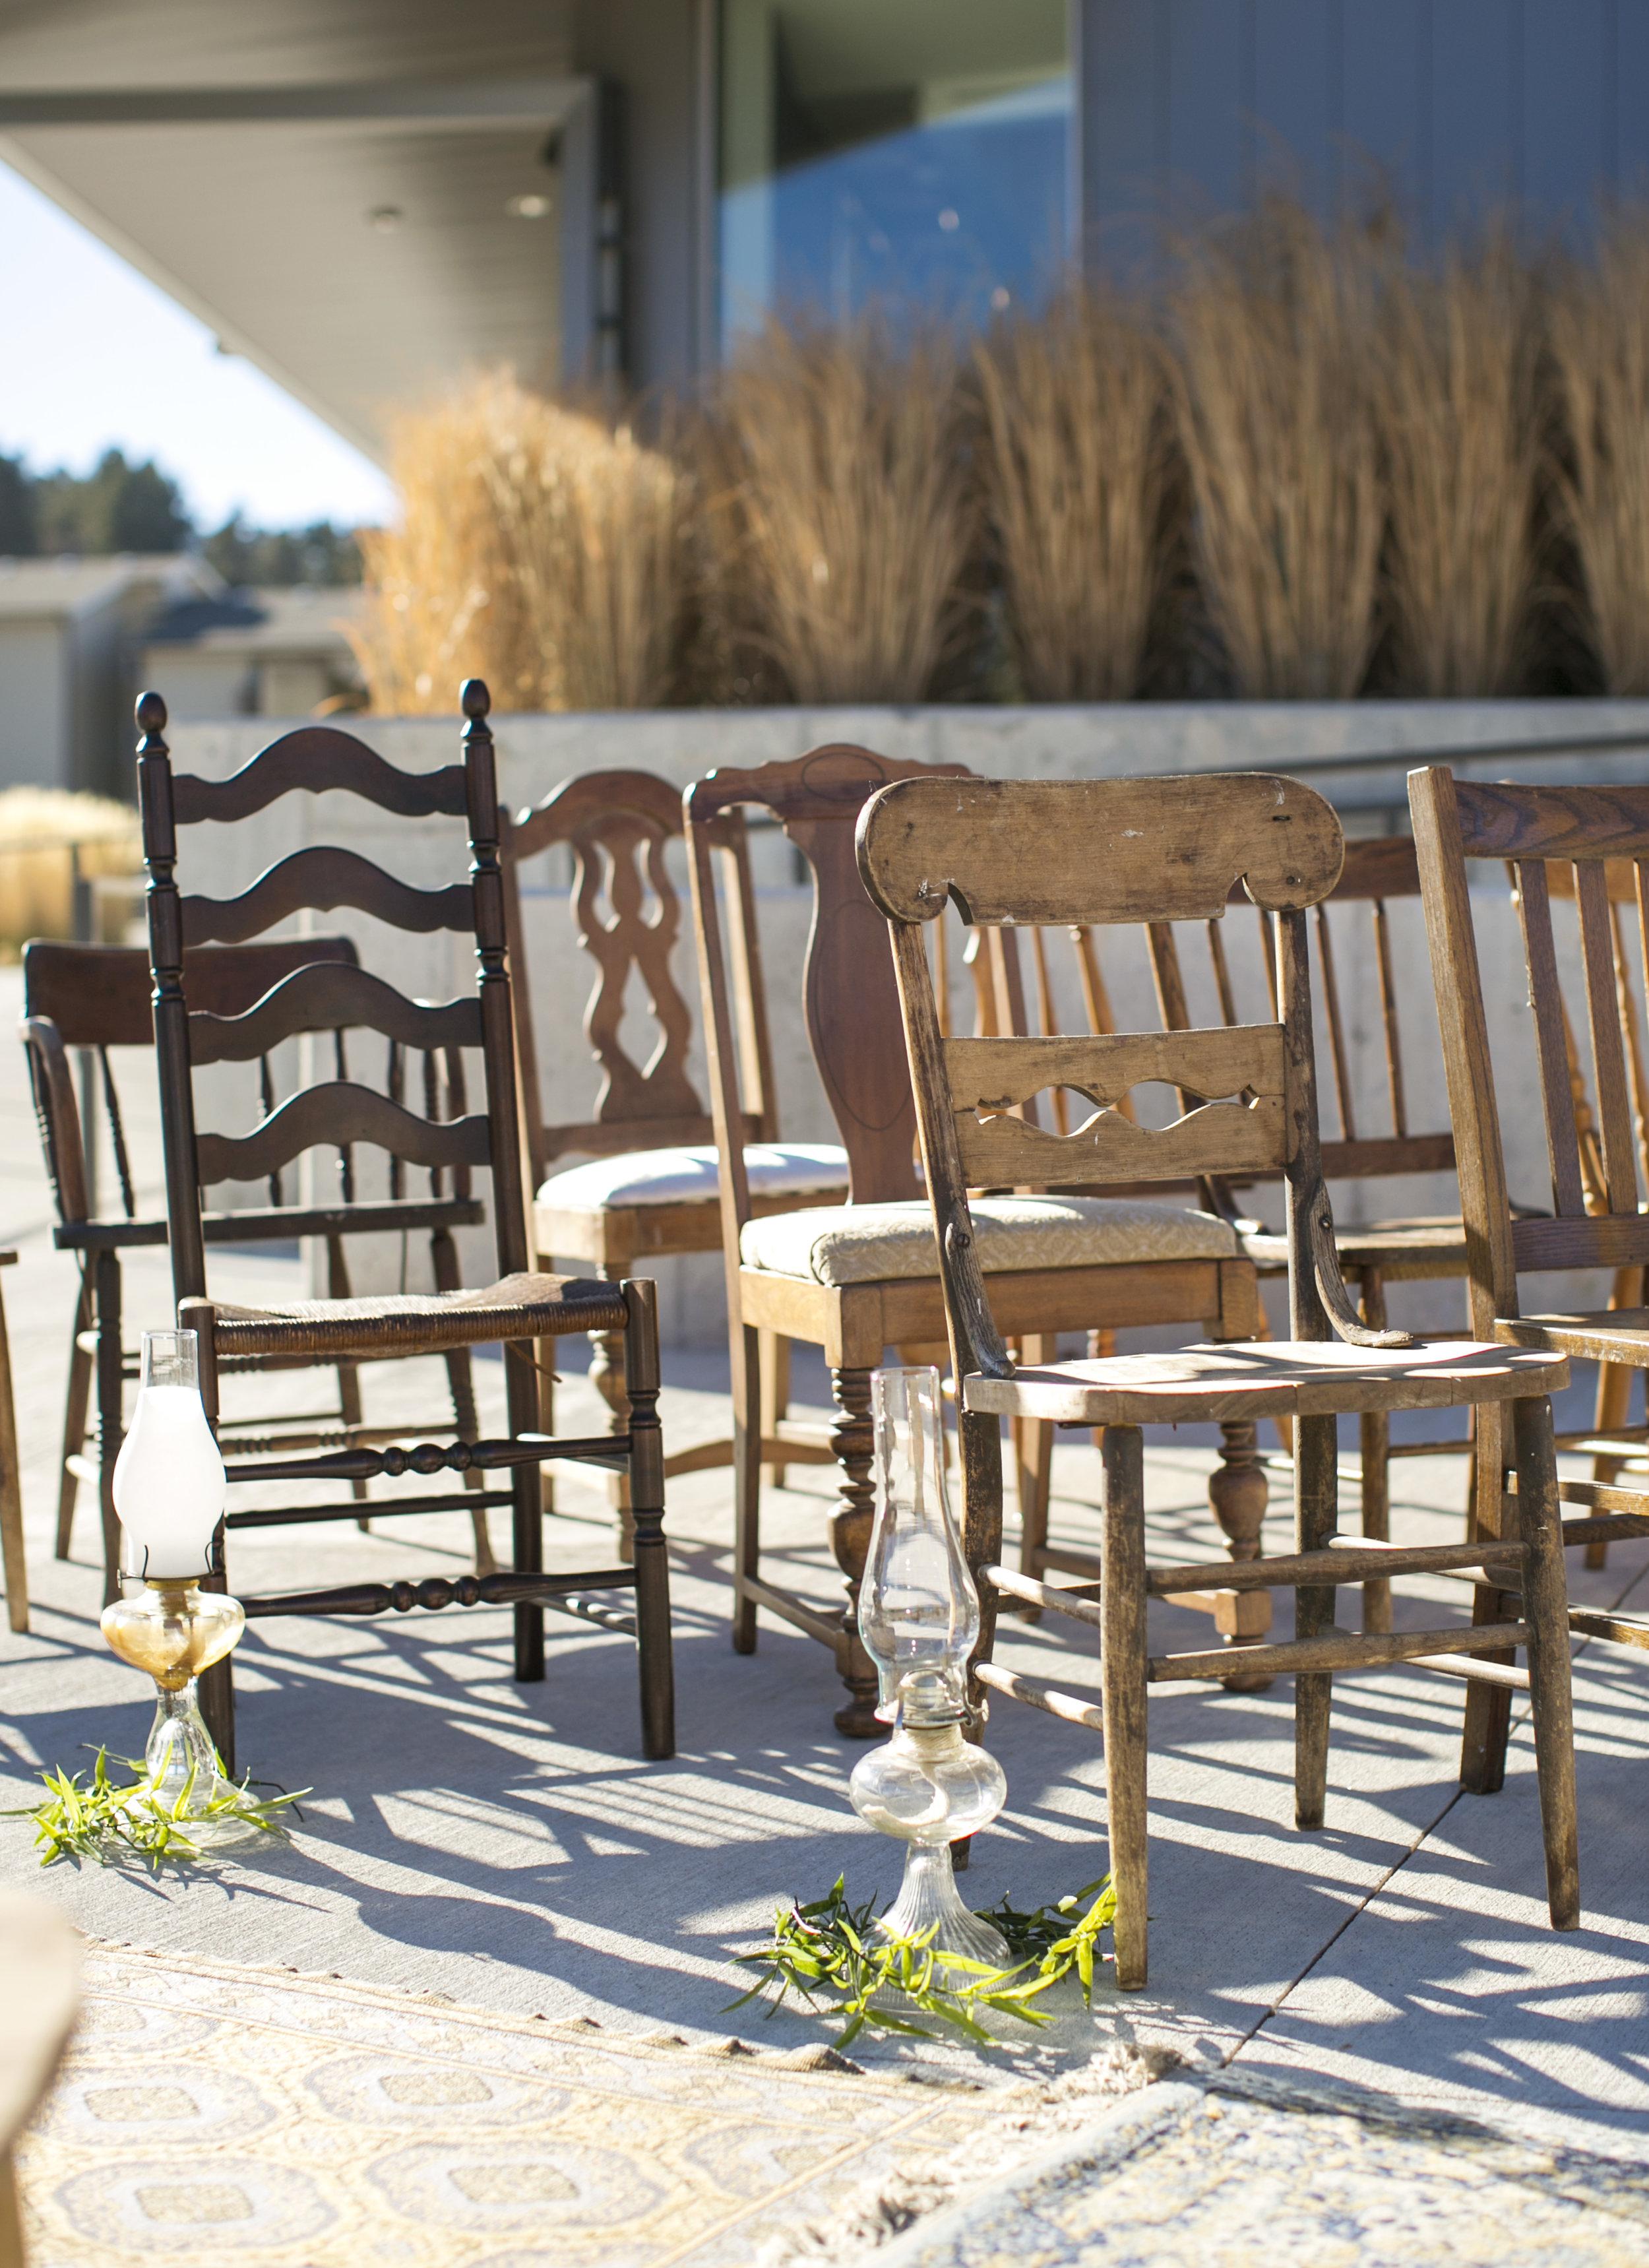 mismatch wooden chairs